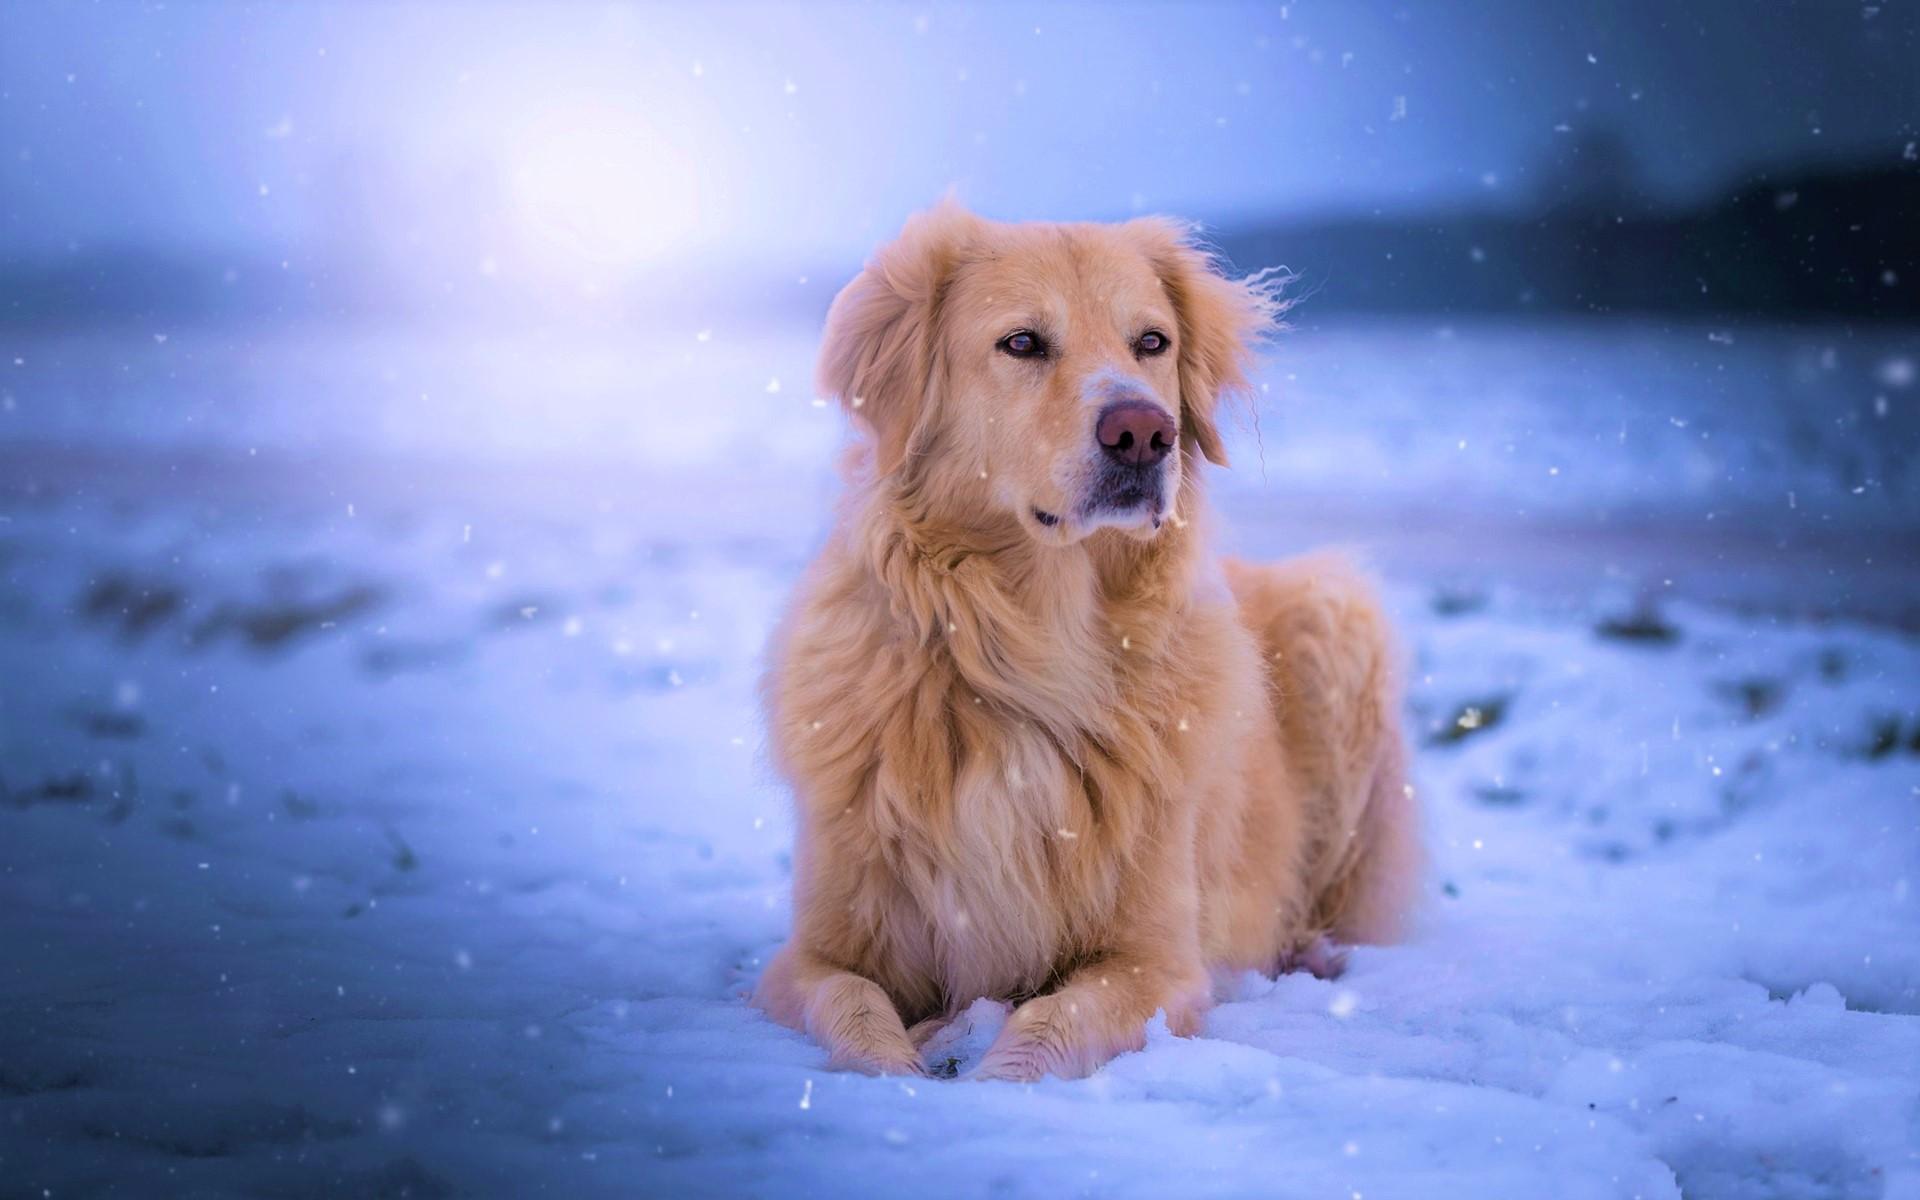 Dog Snow Winter Snowfall Pet 1920x1200